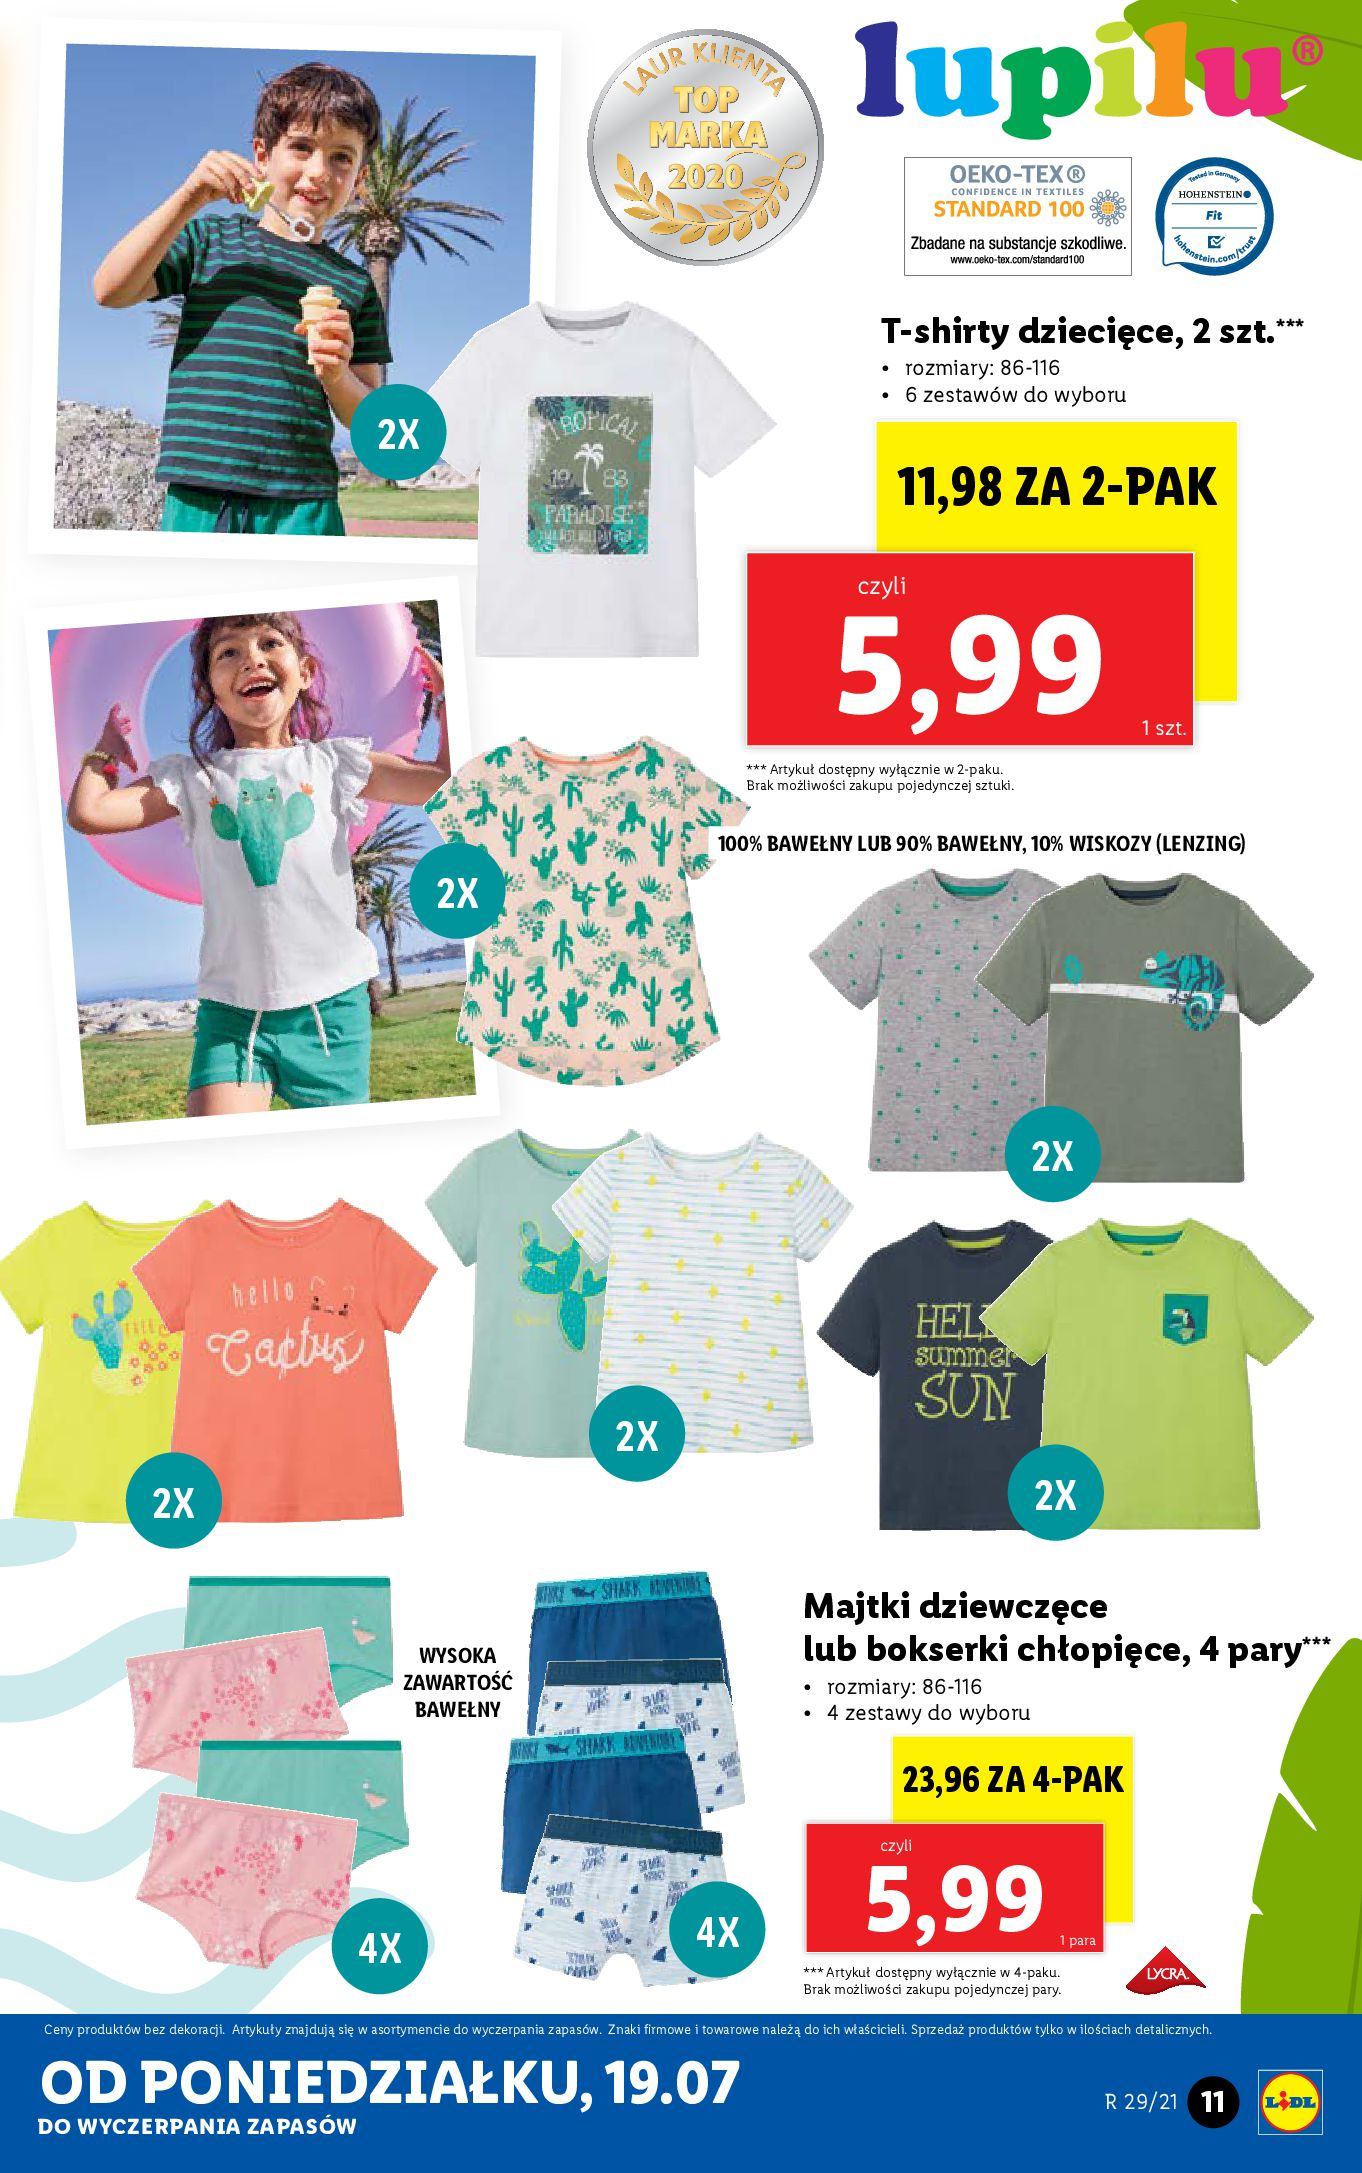 Gazetka Lidl: Gazetka Lidl - Katalog od 19.07 2021-07-19 page-11